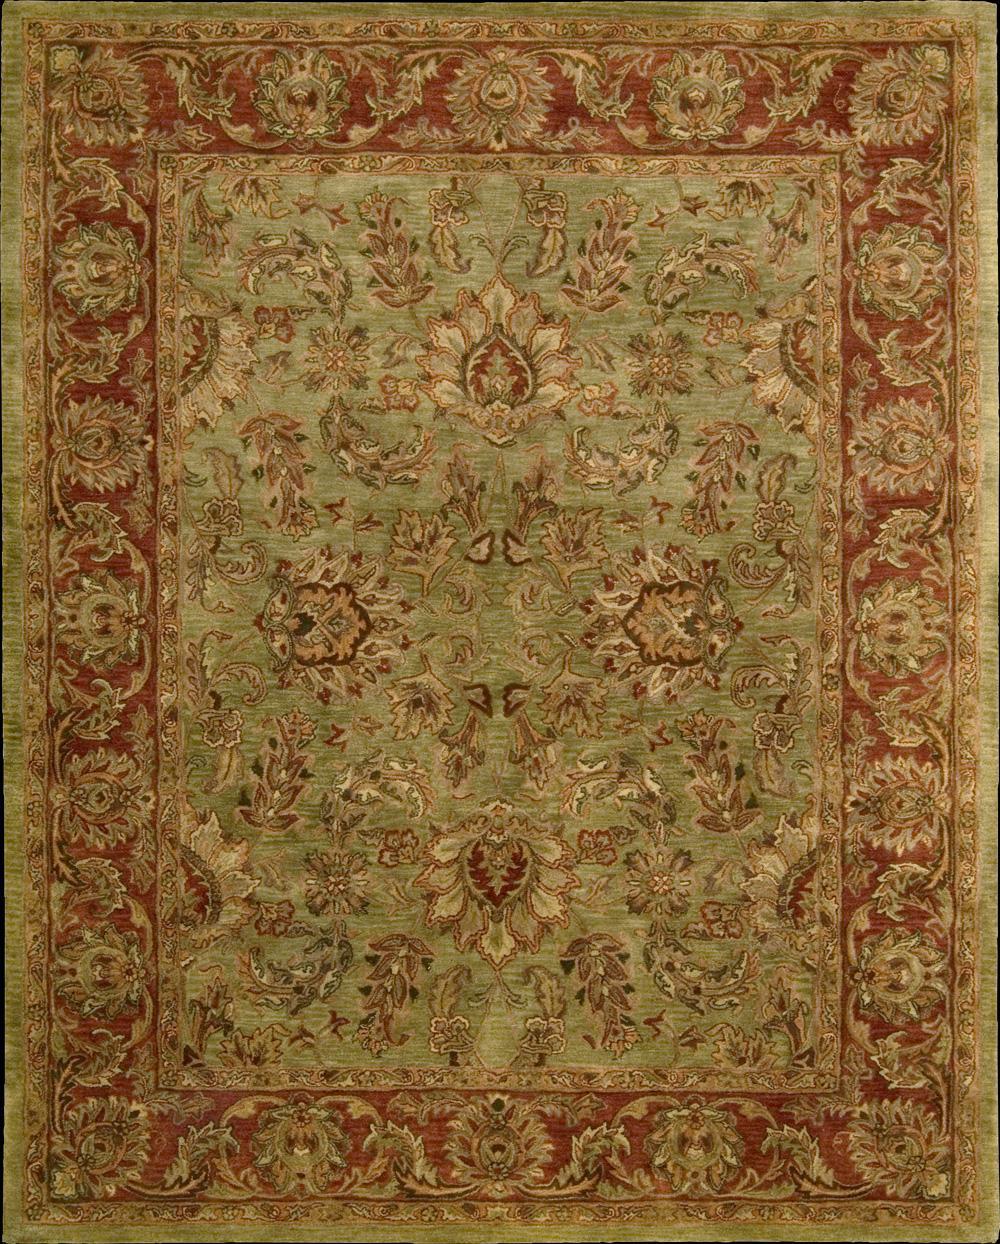 "Nourison Jaipur Area Rug 8'3"" x 11'6"" - Item Number: 30086"